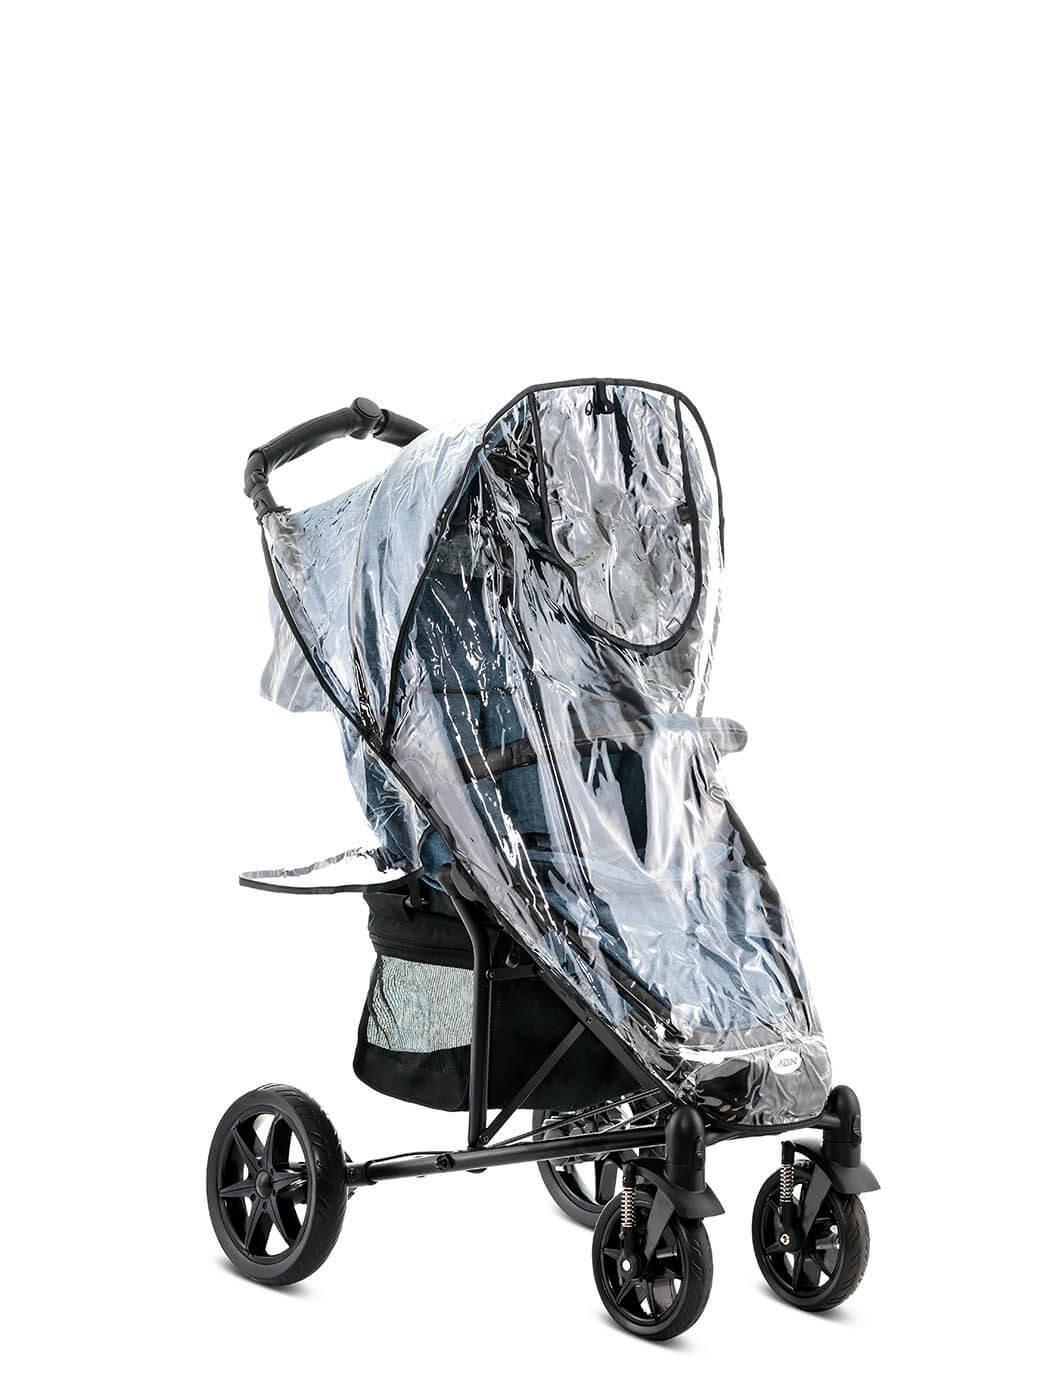 Дождевики для колясок Дождевик для Moon Kiss/Flac FLAC_blue_melange_61.610.300-990_Regenverdeck-2.jpg